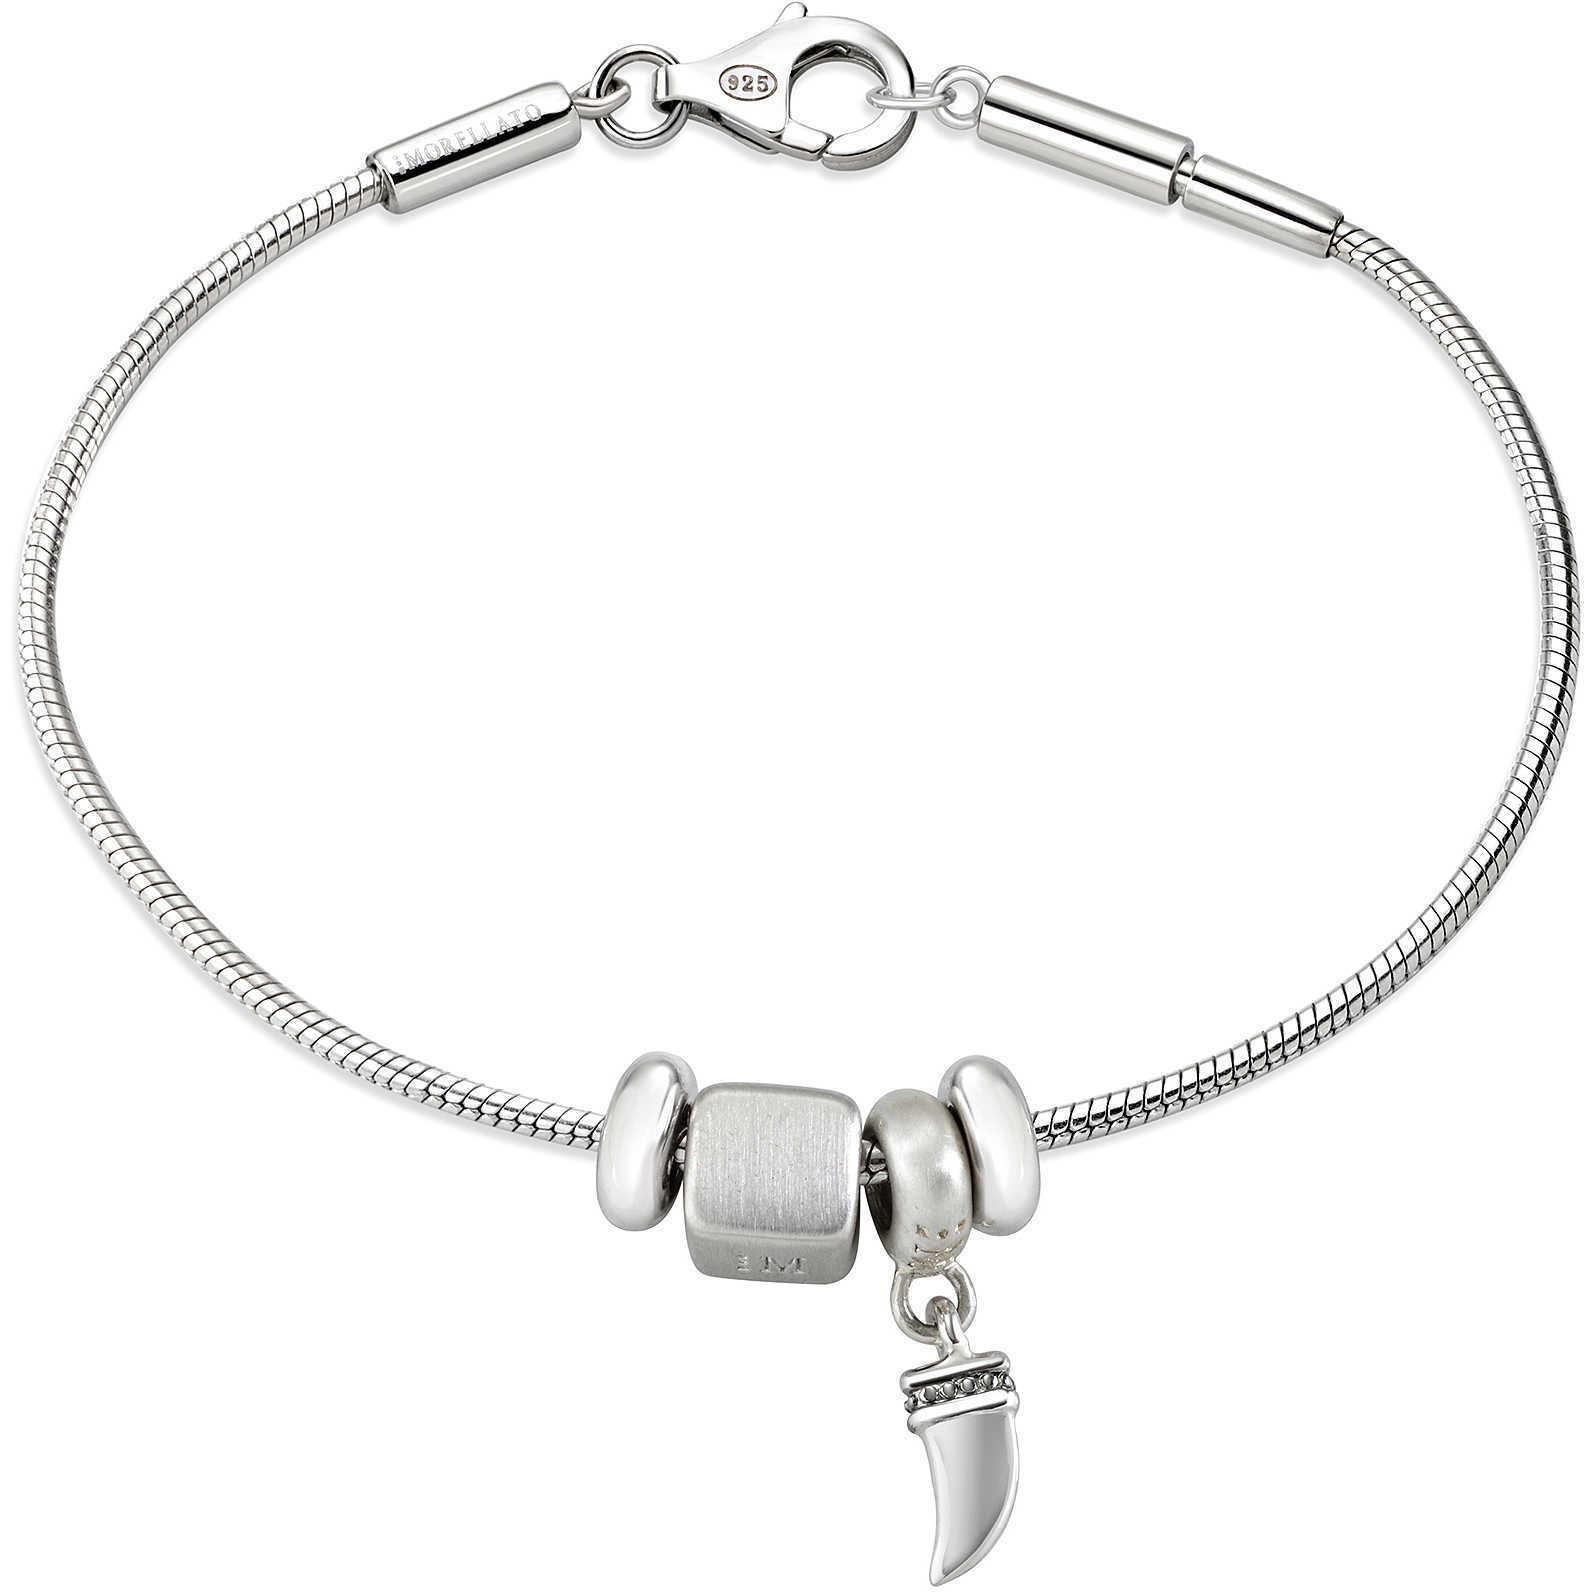 Bracelet Men's Jewelry Morellato Safz132